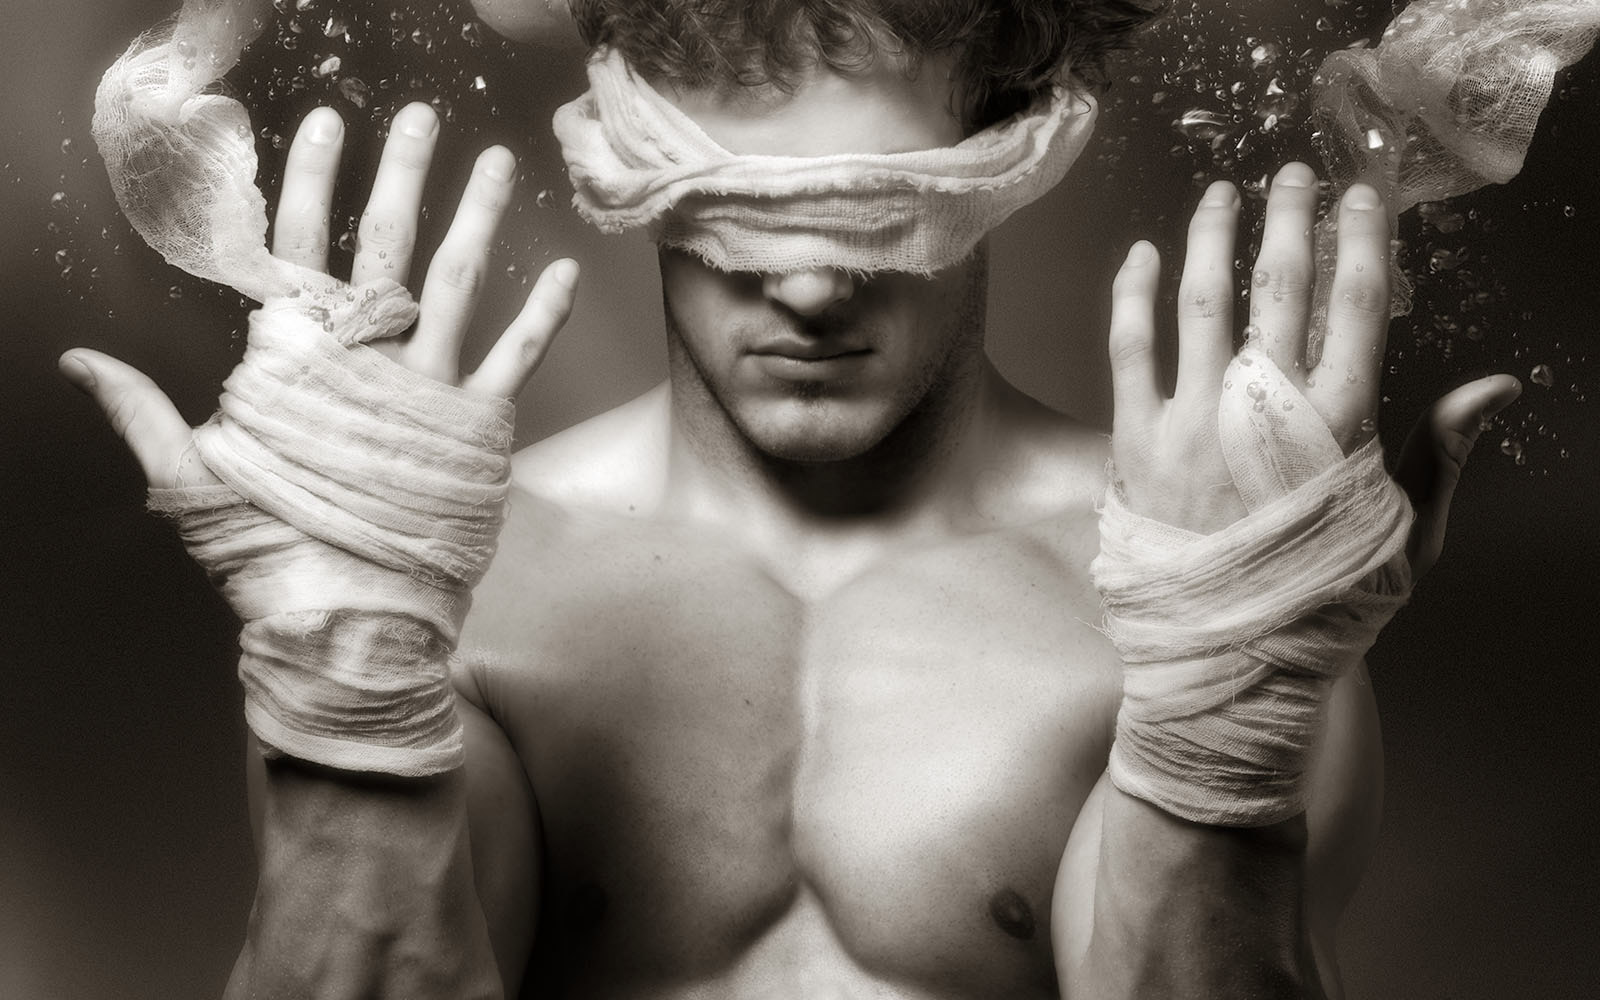 Marc Jenkins-Fotografía-Fotografía Erótica-Fotografía Erótica Gay-desnudos-desnudo masculino